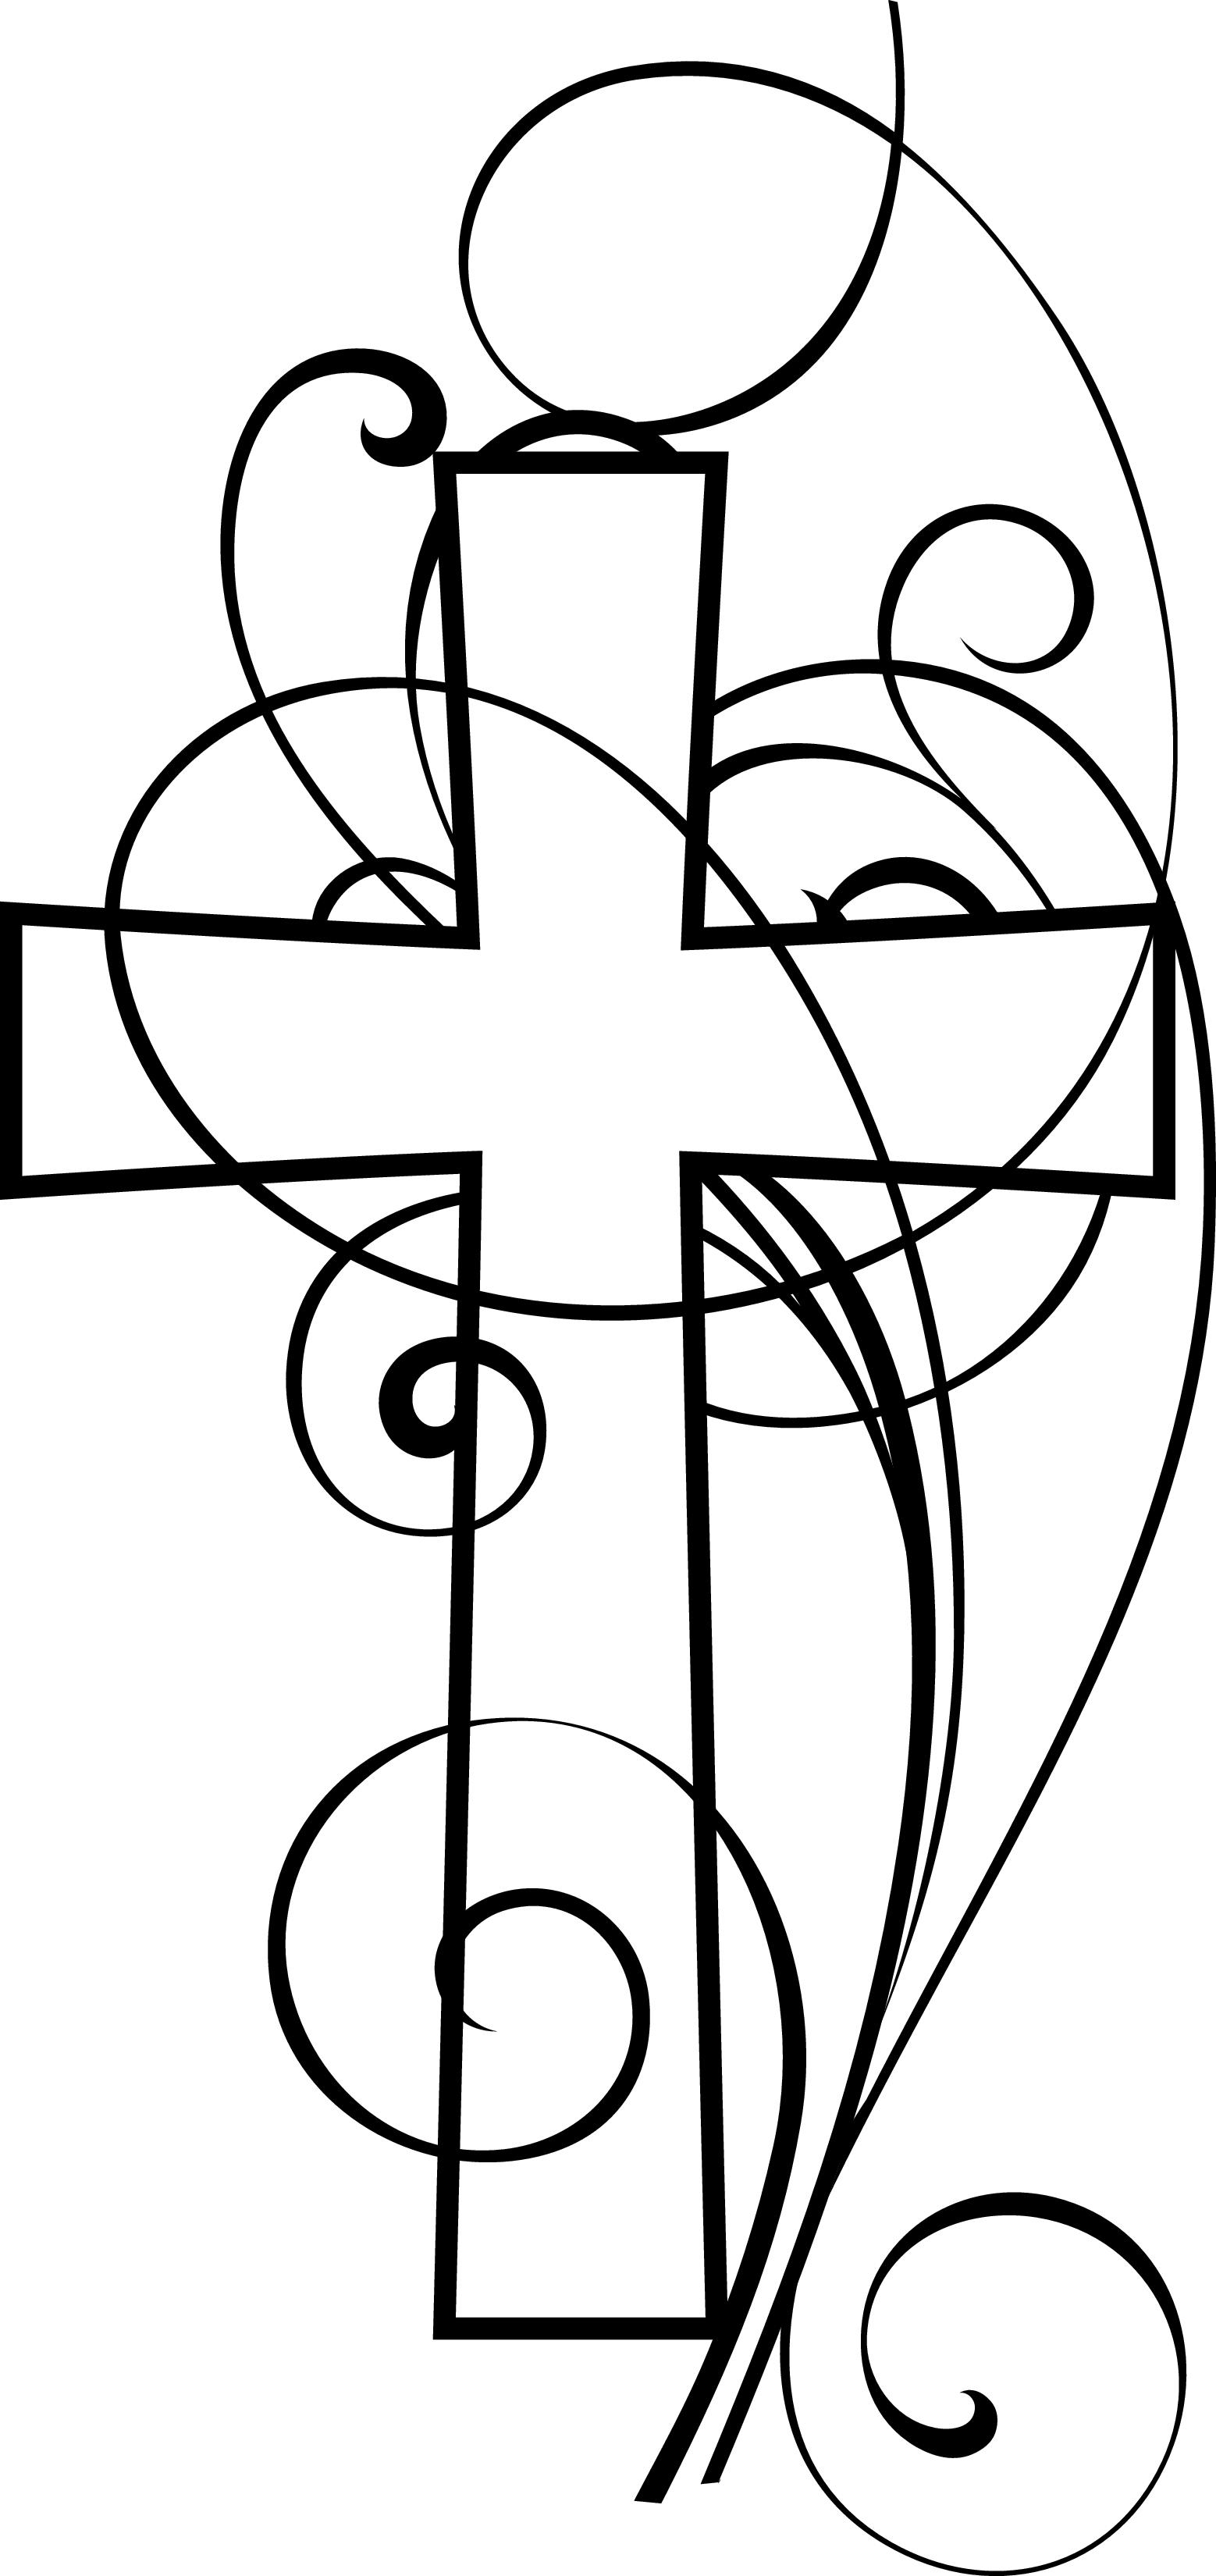 Clip art for bulletins. Catholic clipart bulletin